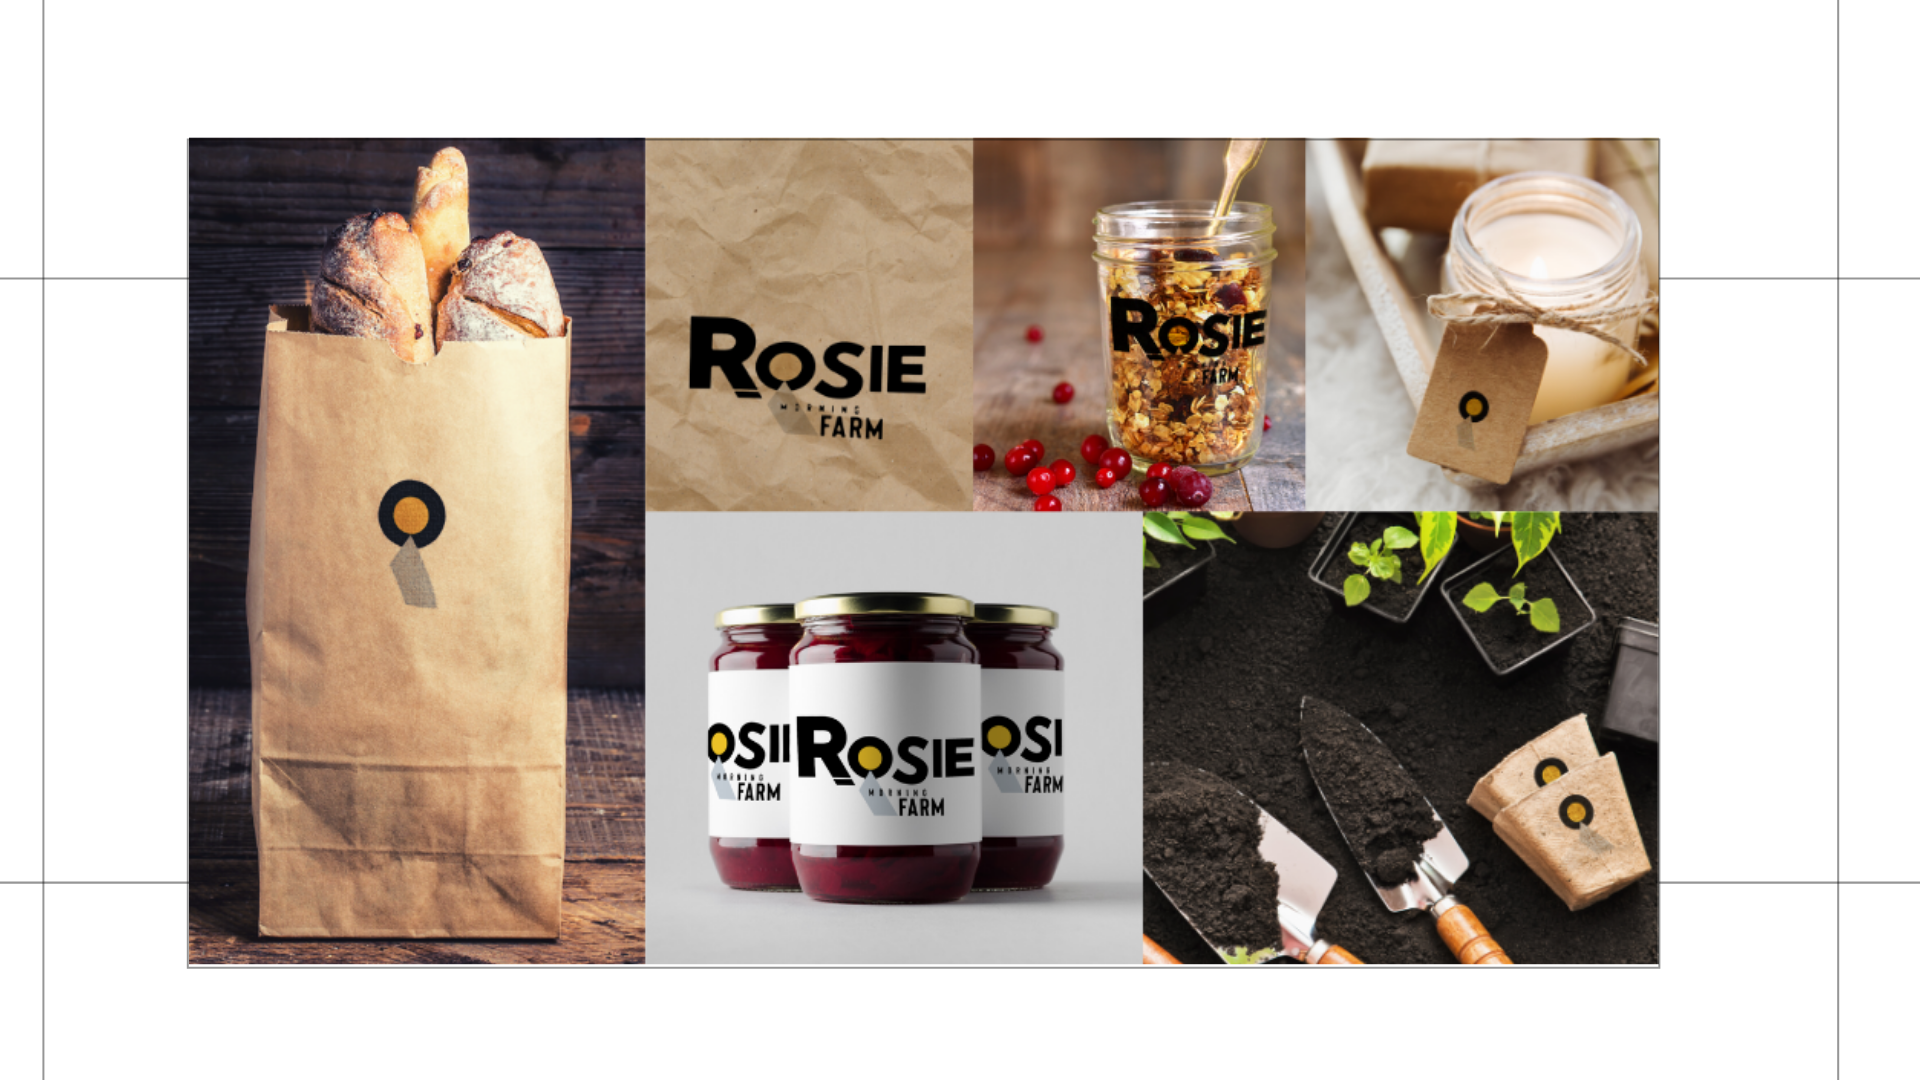 Logo mockups created by Owl Street Studio for Rosie Morning Farm